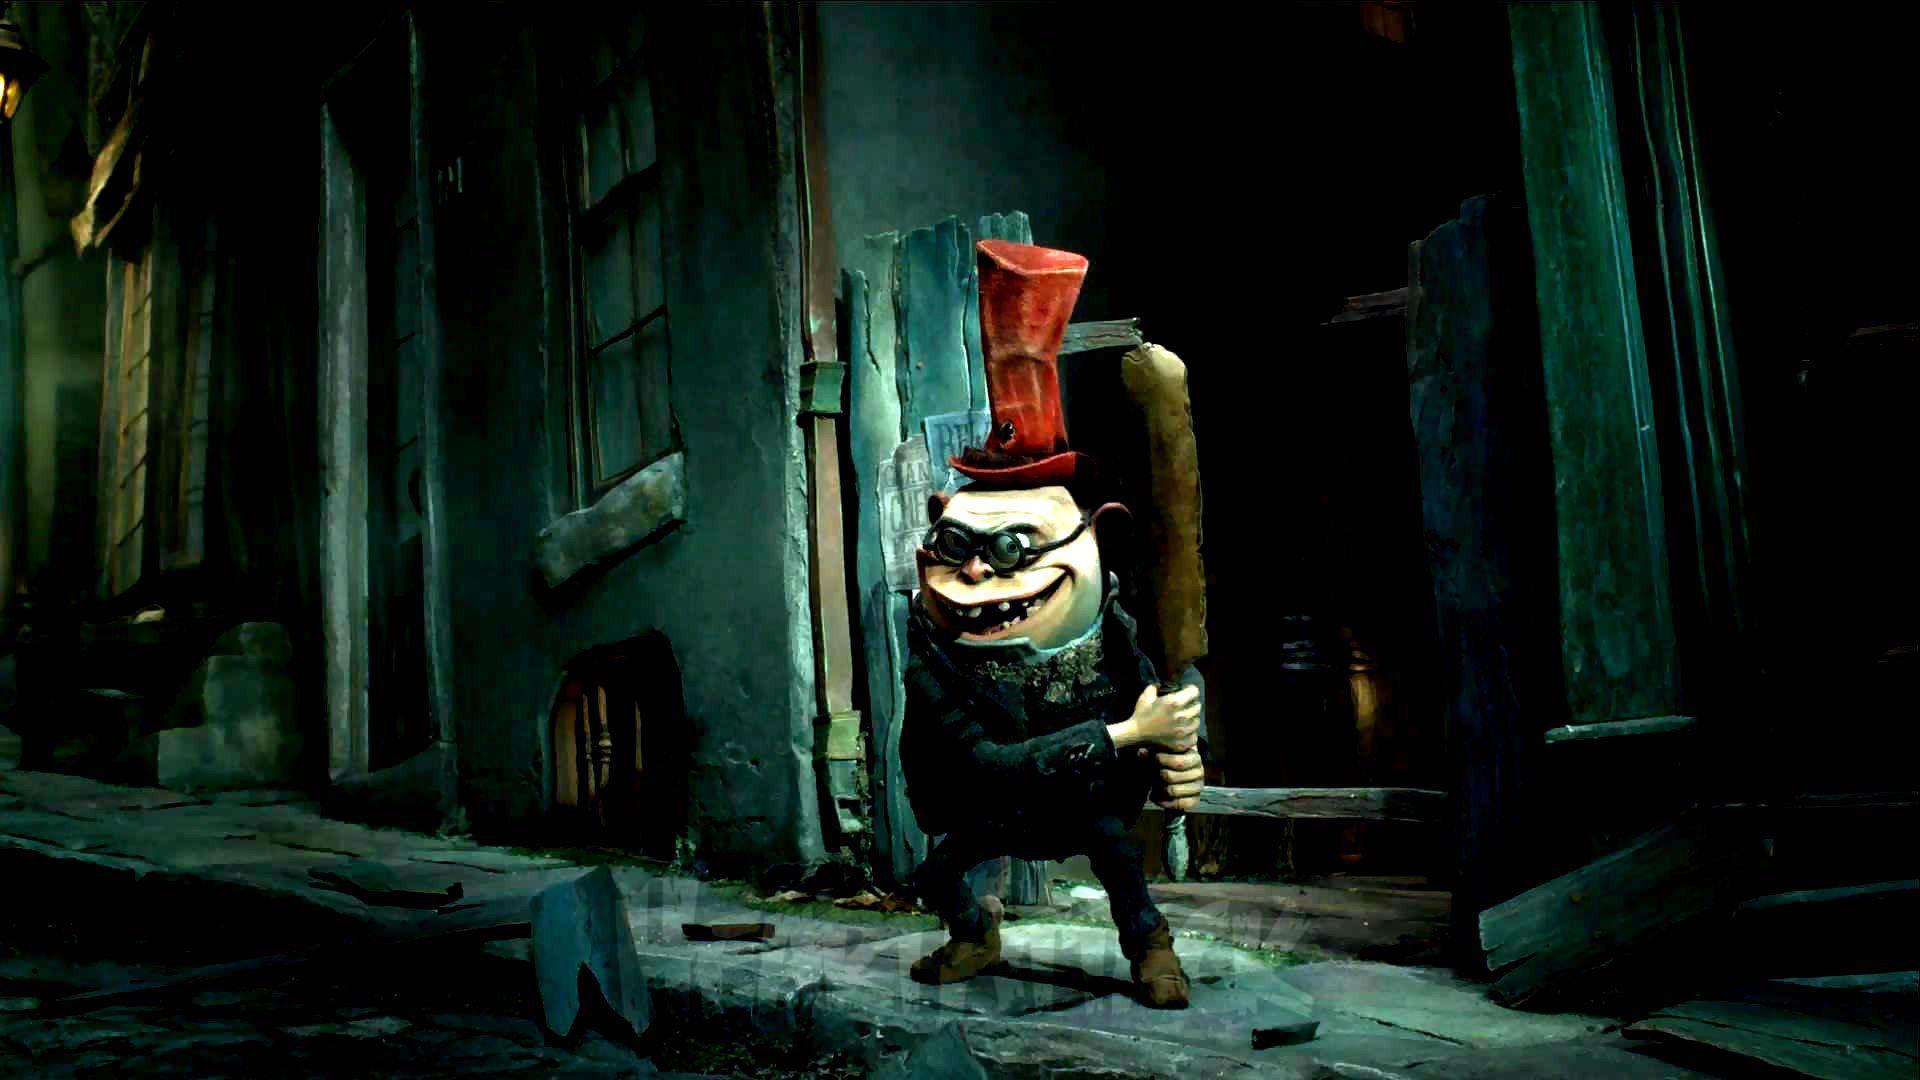 3d Clown Wallpaper Hd Boxtrolls Animation Family Comedy Cartoon Movie Film